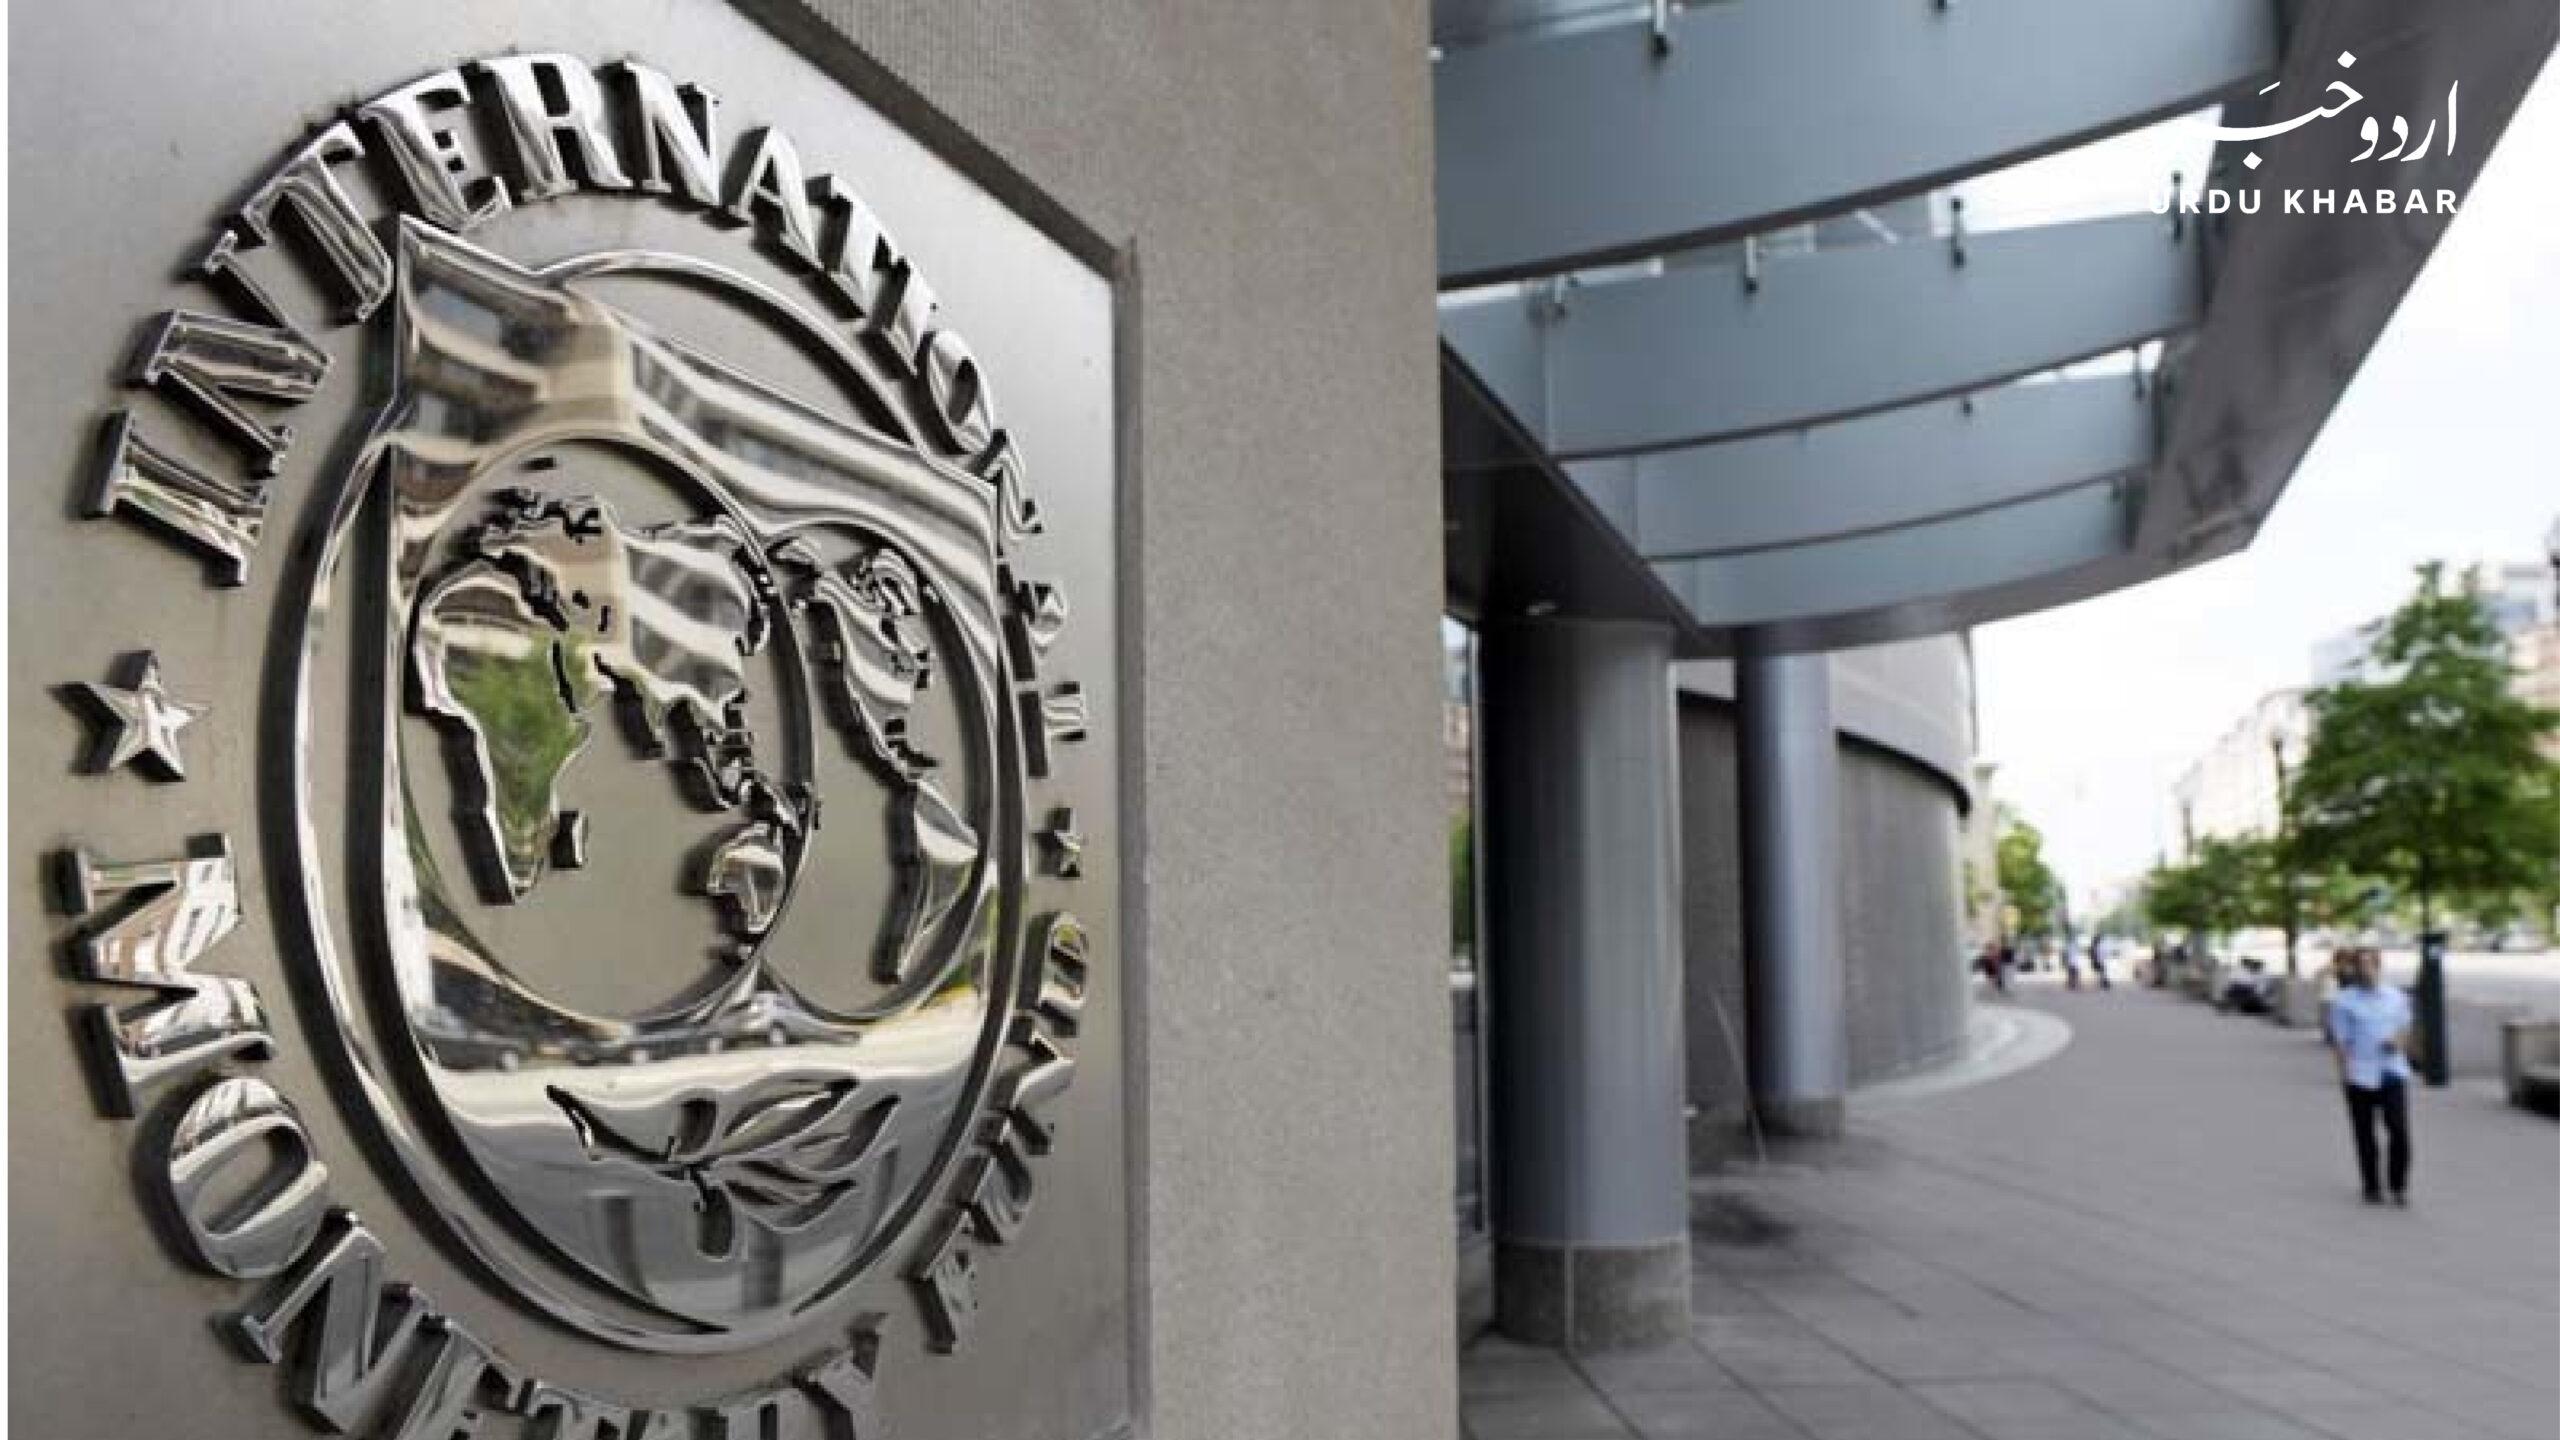 آئی ایم ایف بورڈ پاکستان کو 500 ملین ڈالر دینے پر راضی ہو گیا